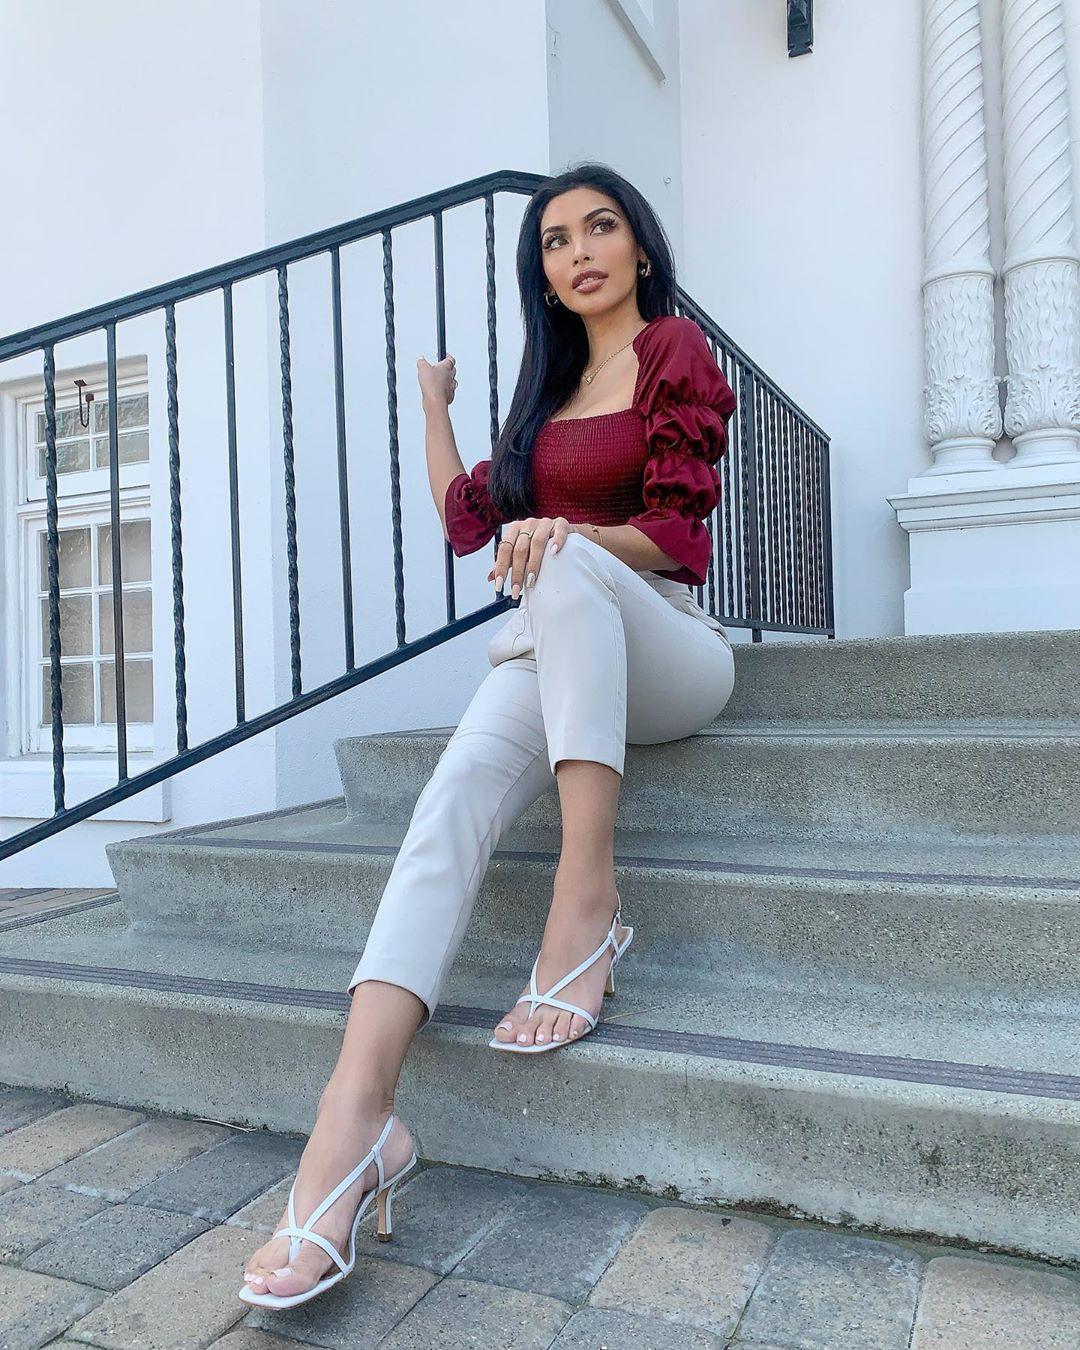 Tania Lucely cute girls photos, fine legs, clothing ideas